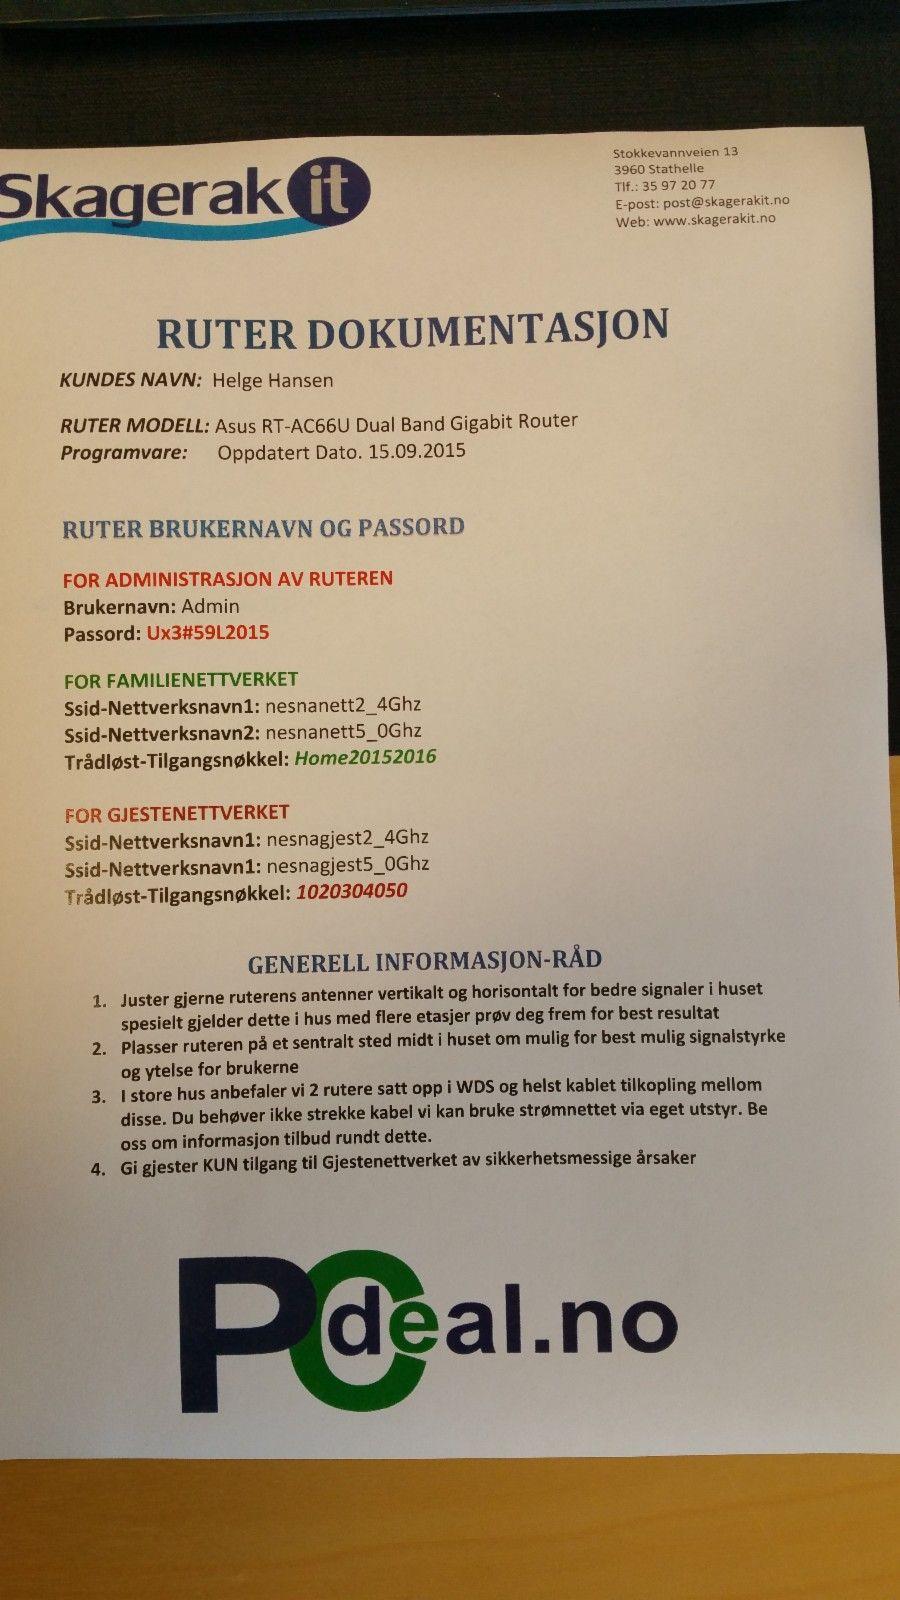 PASS PÅ! HP Elitebook 8460p i5 Ssd 8GB Redusert PRIS Garanti